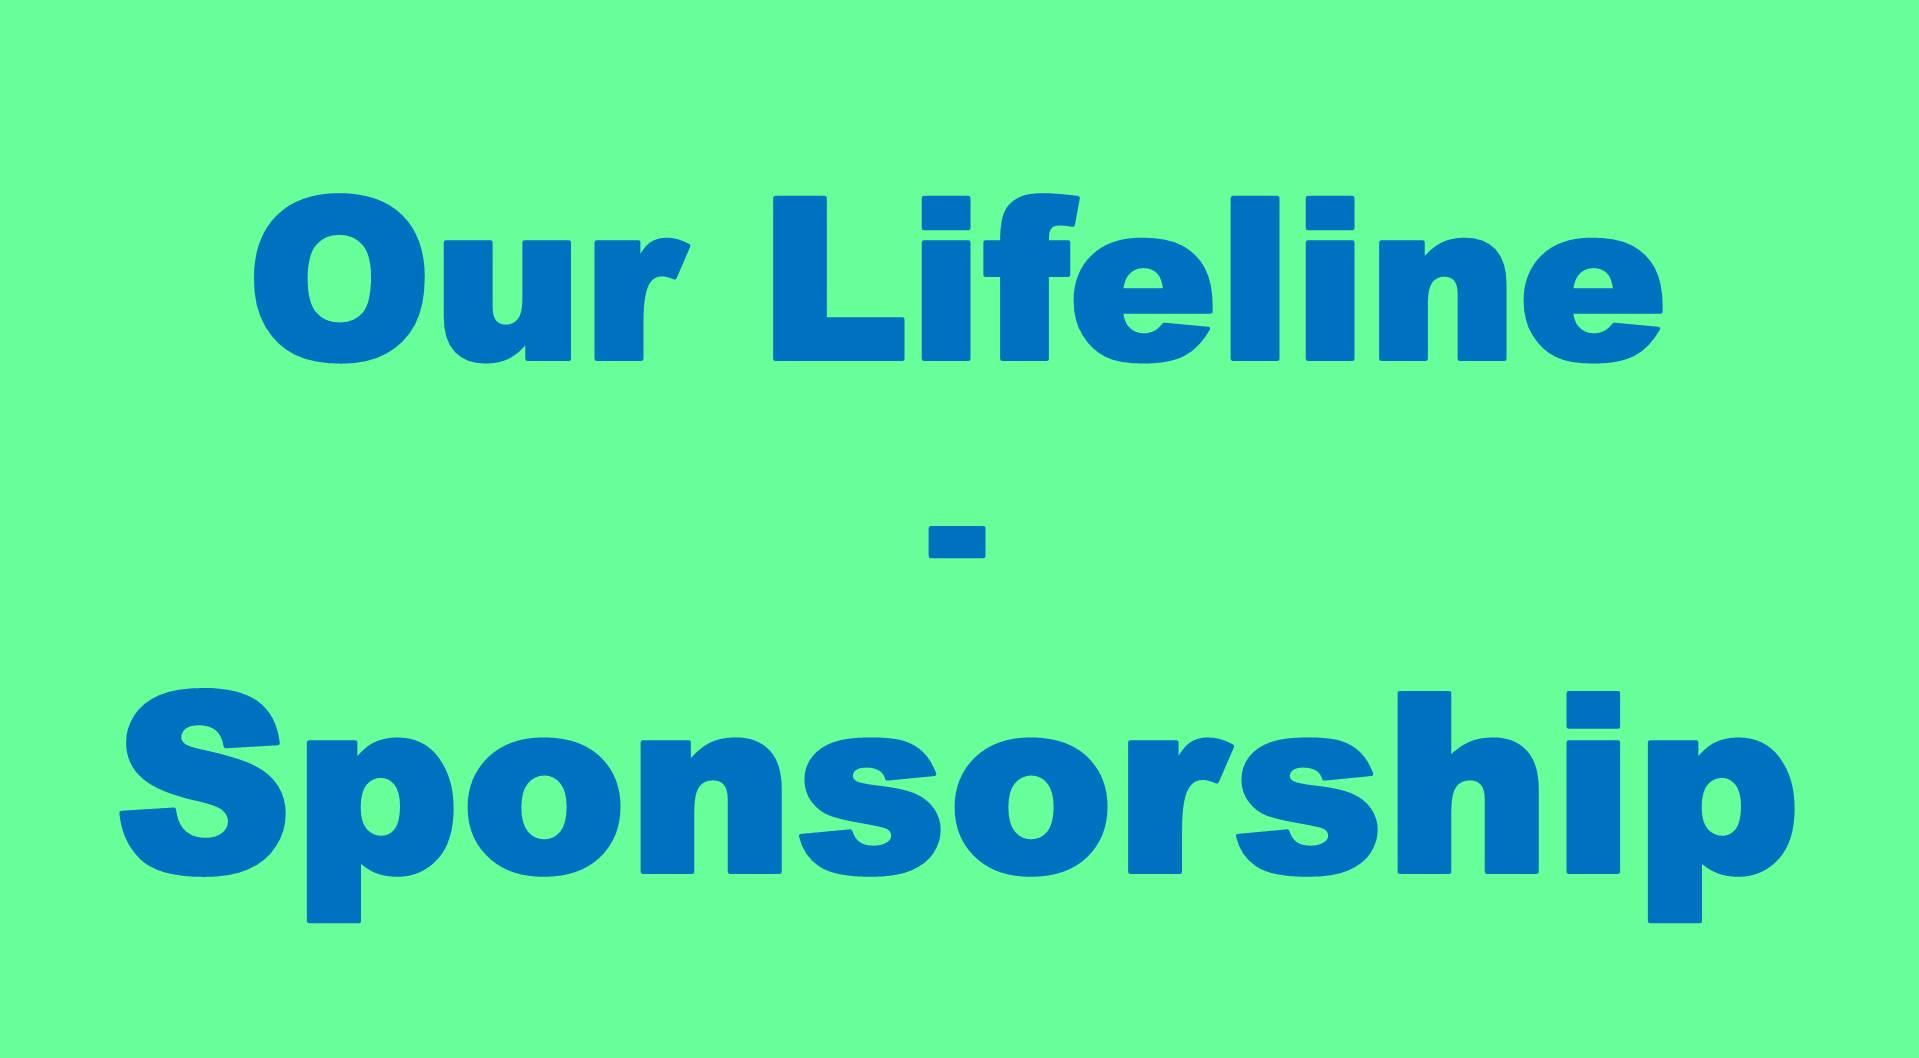 Please consider sponsoring DVR